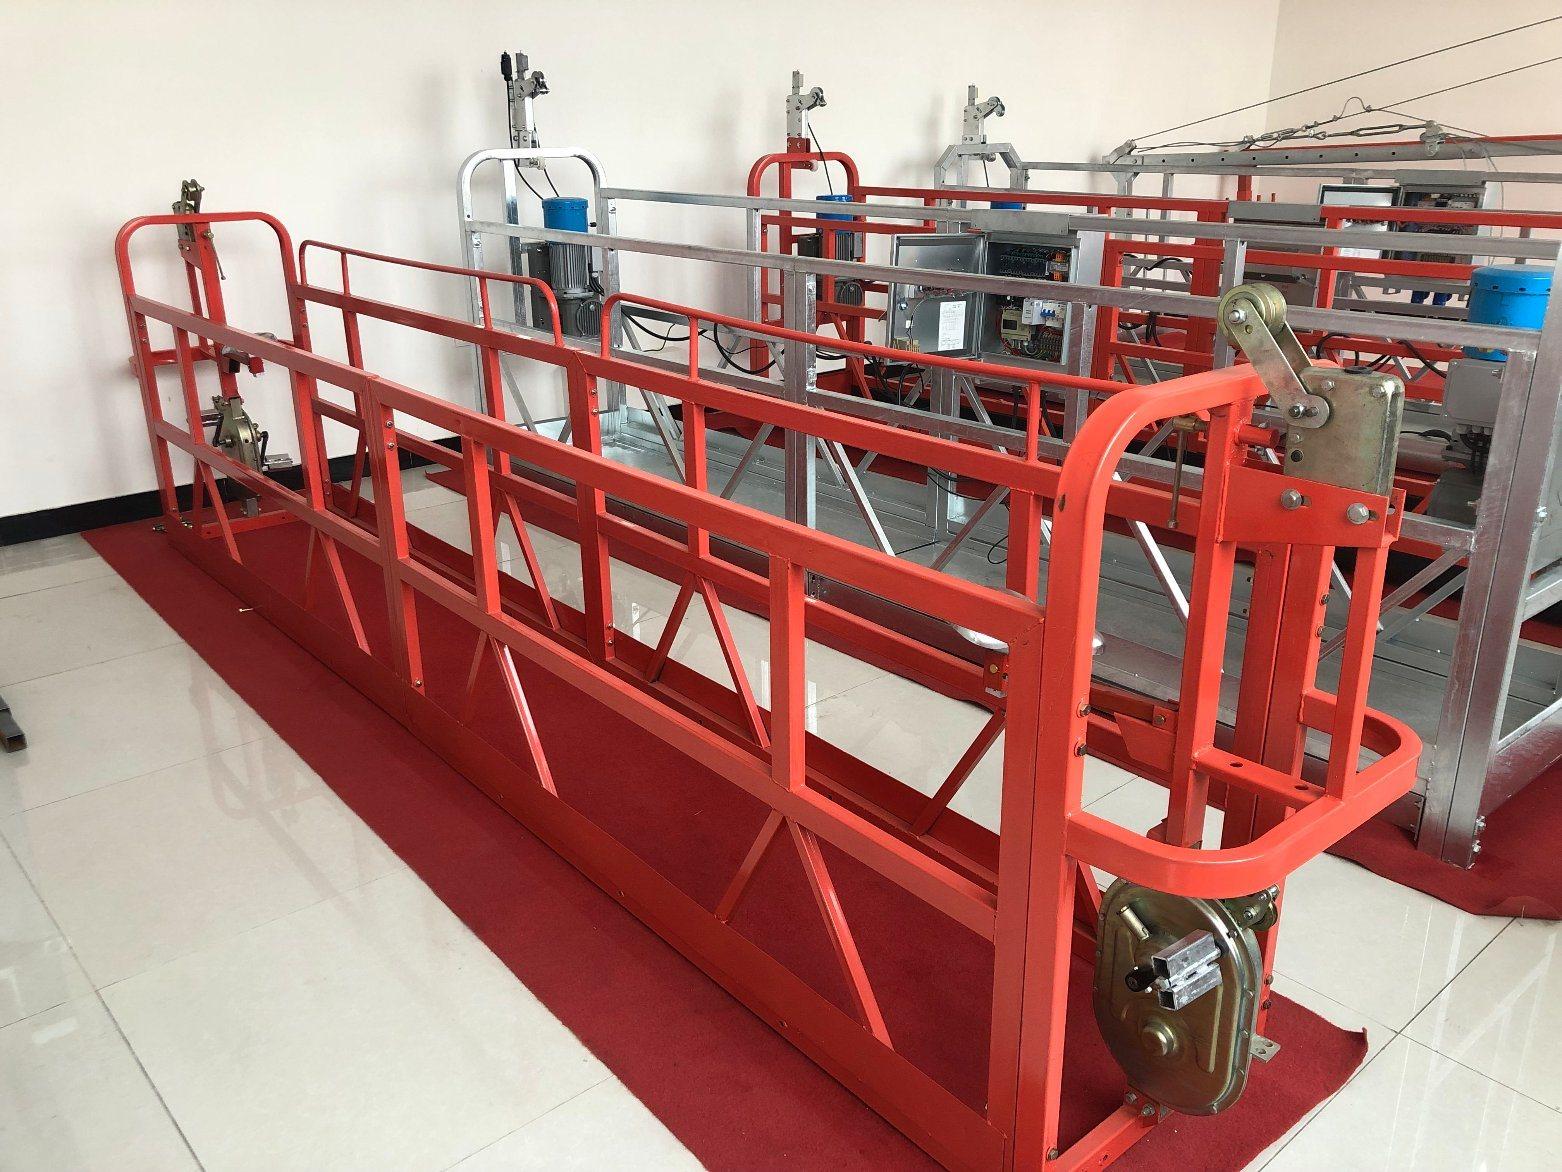 China Suspended Platform Construction Platform Working Platform